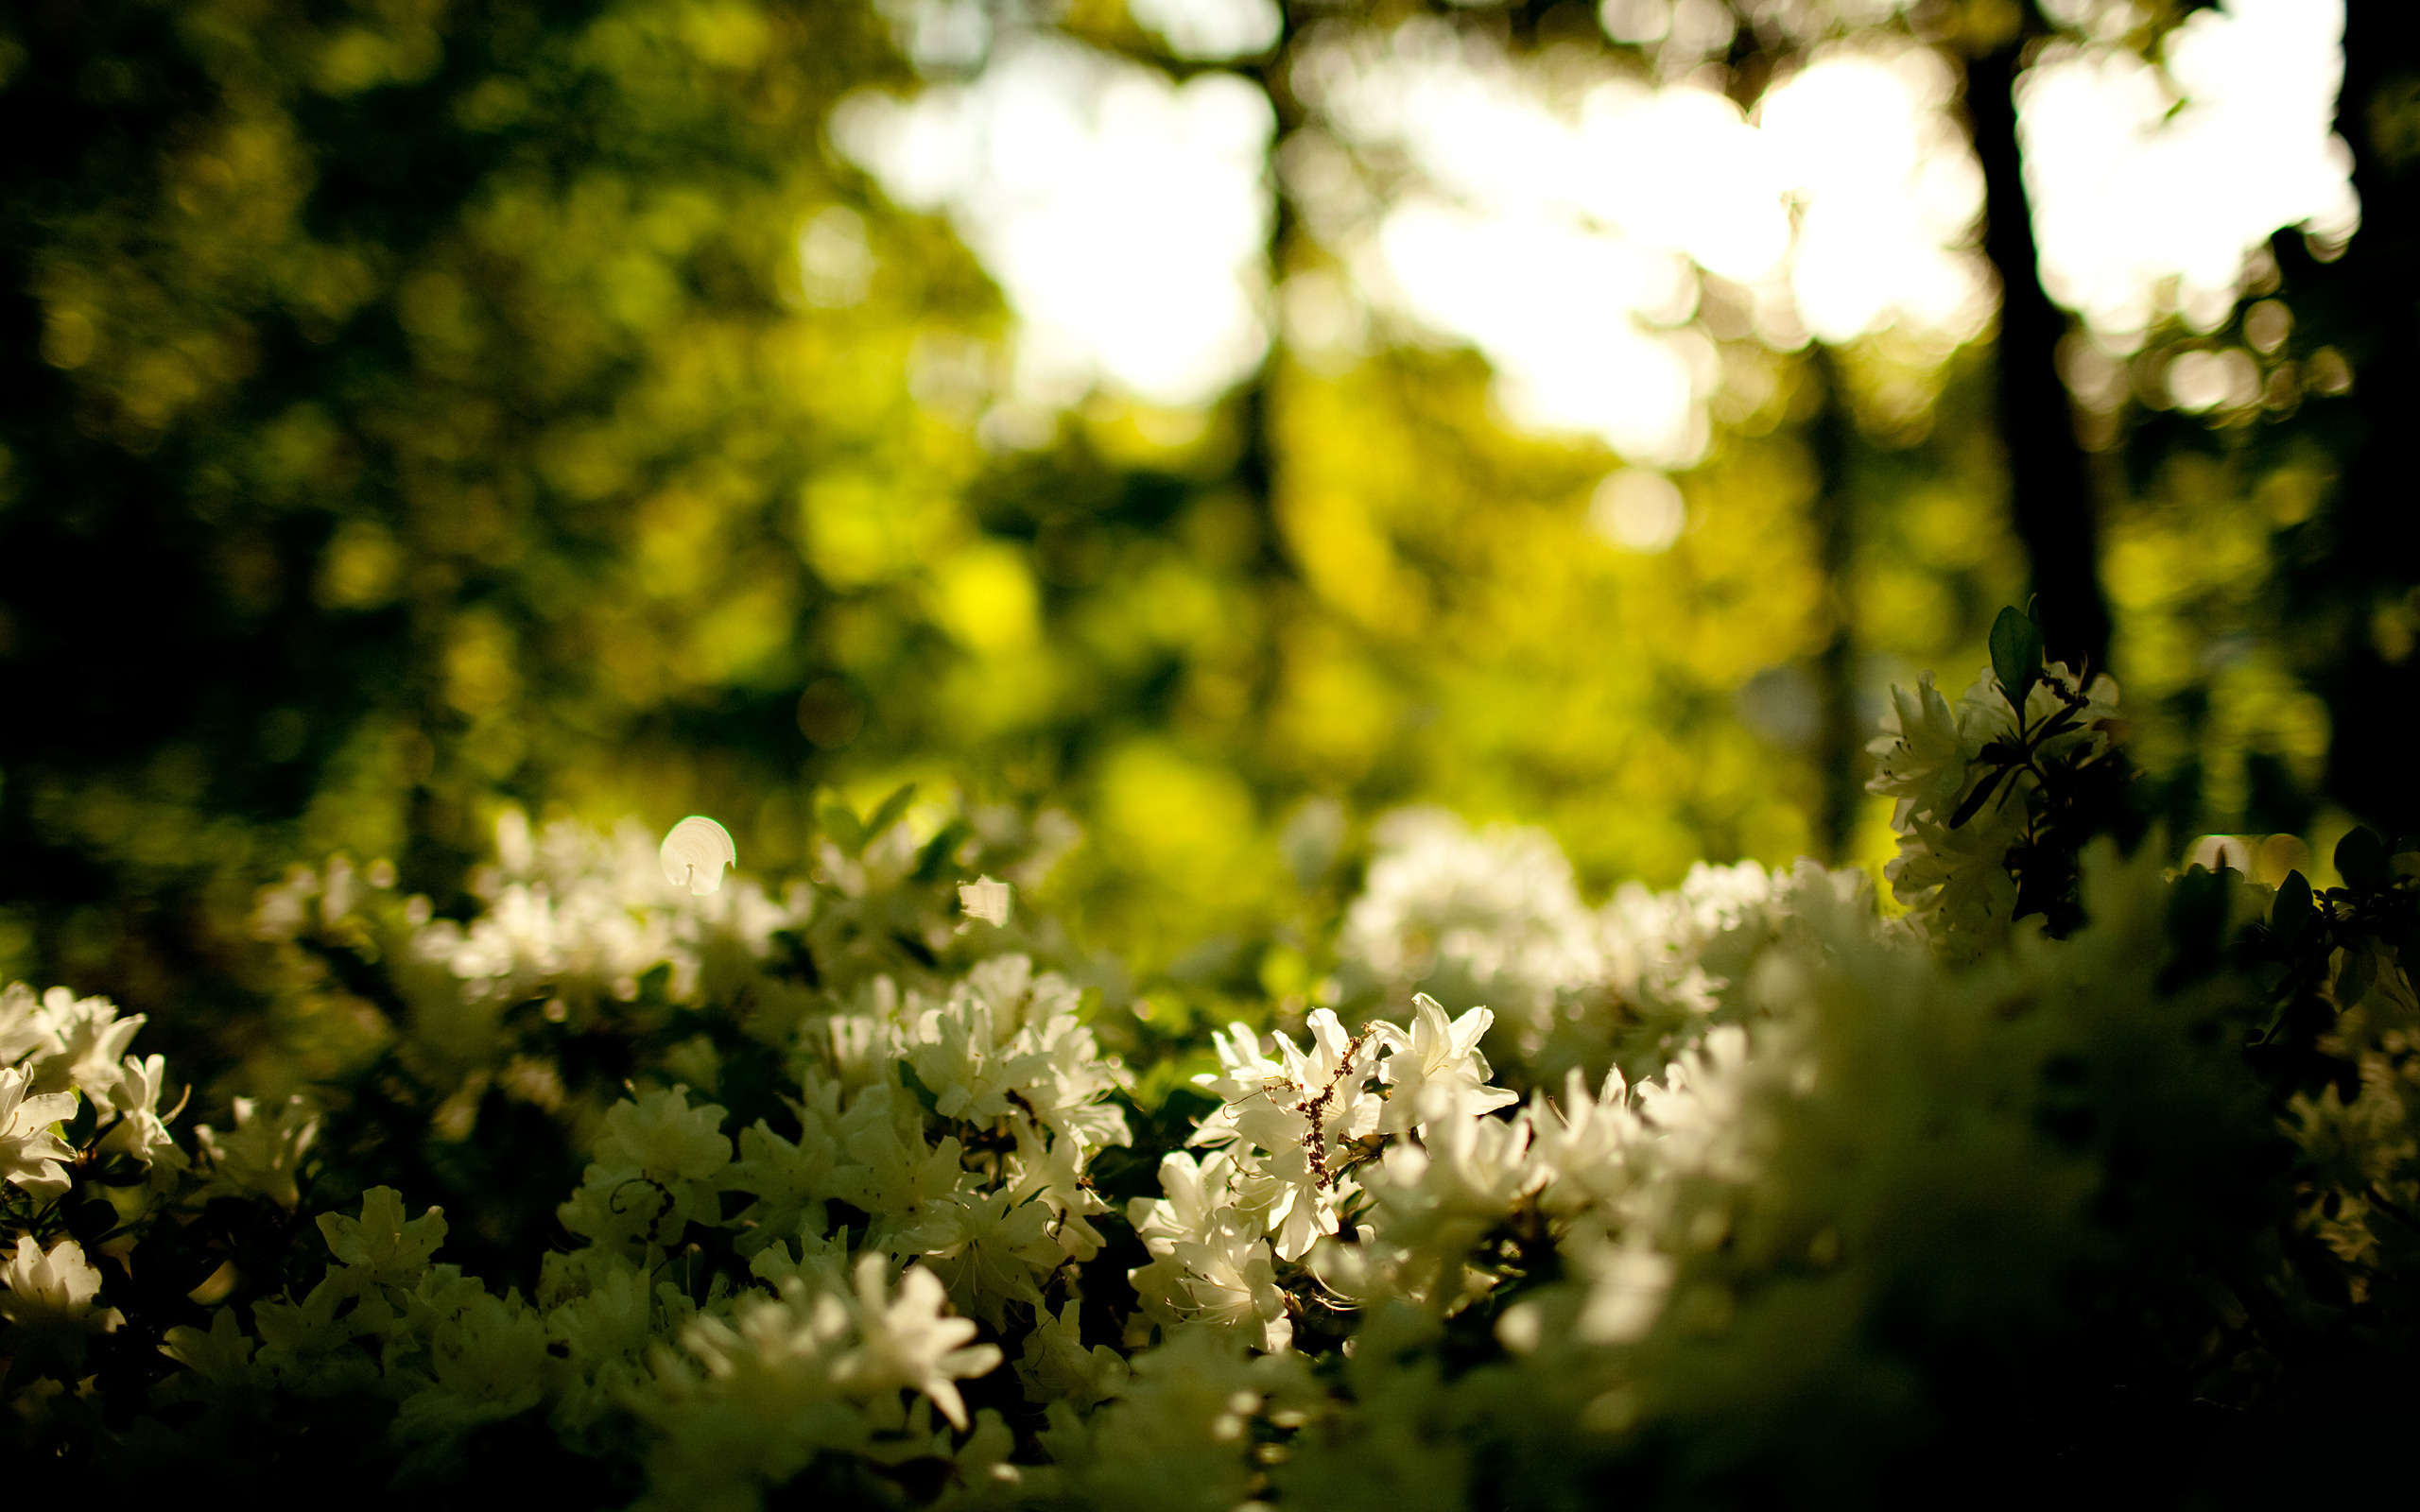 природа белые цветы nature white flowers загрузить